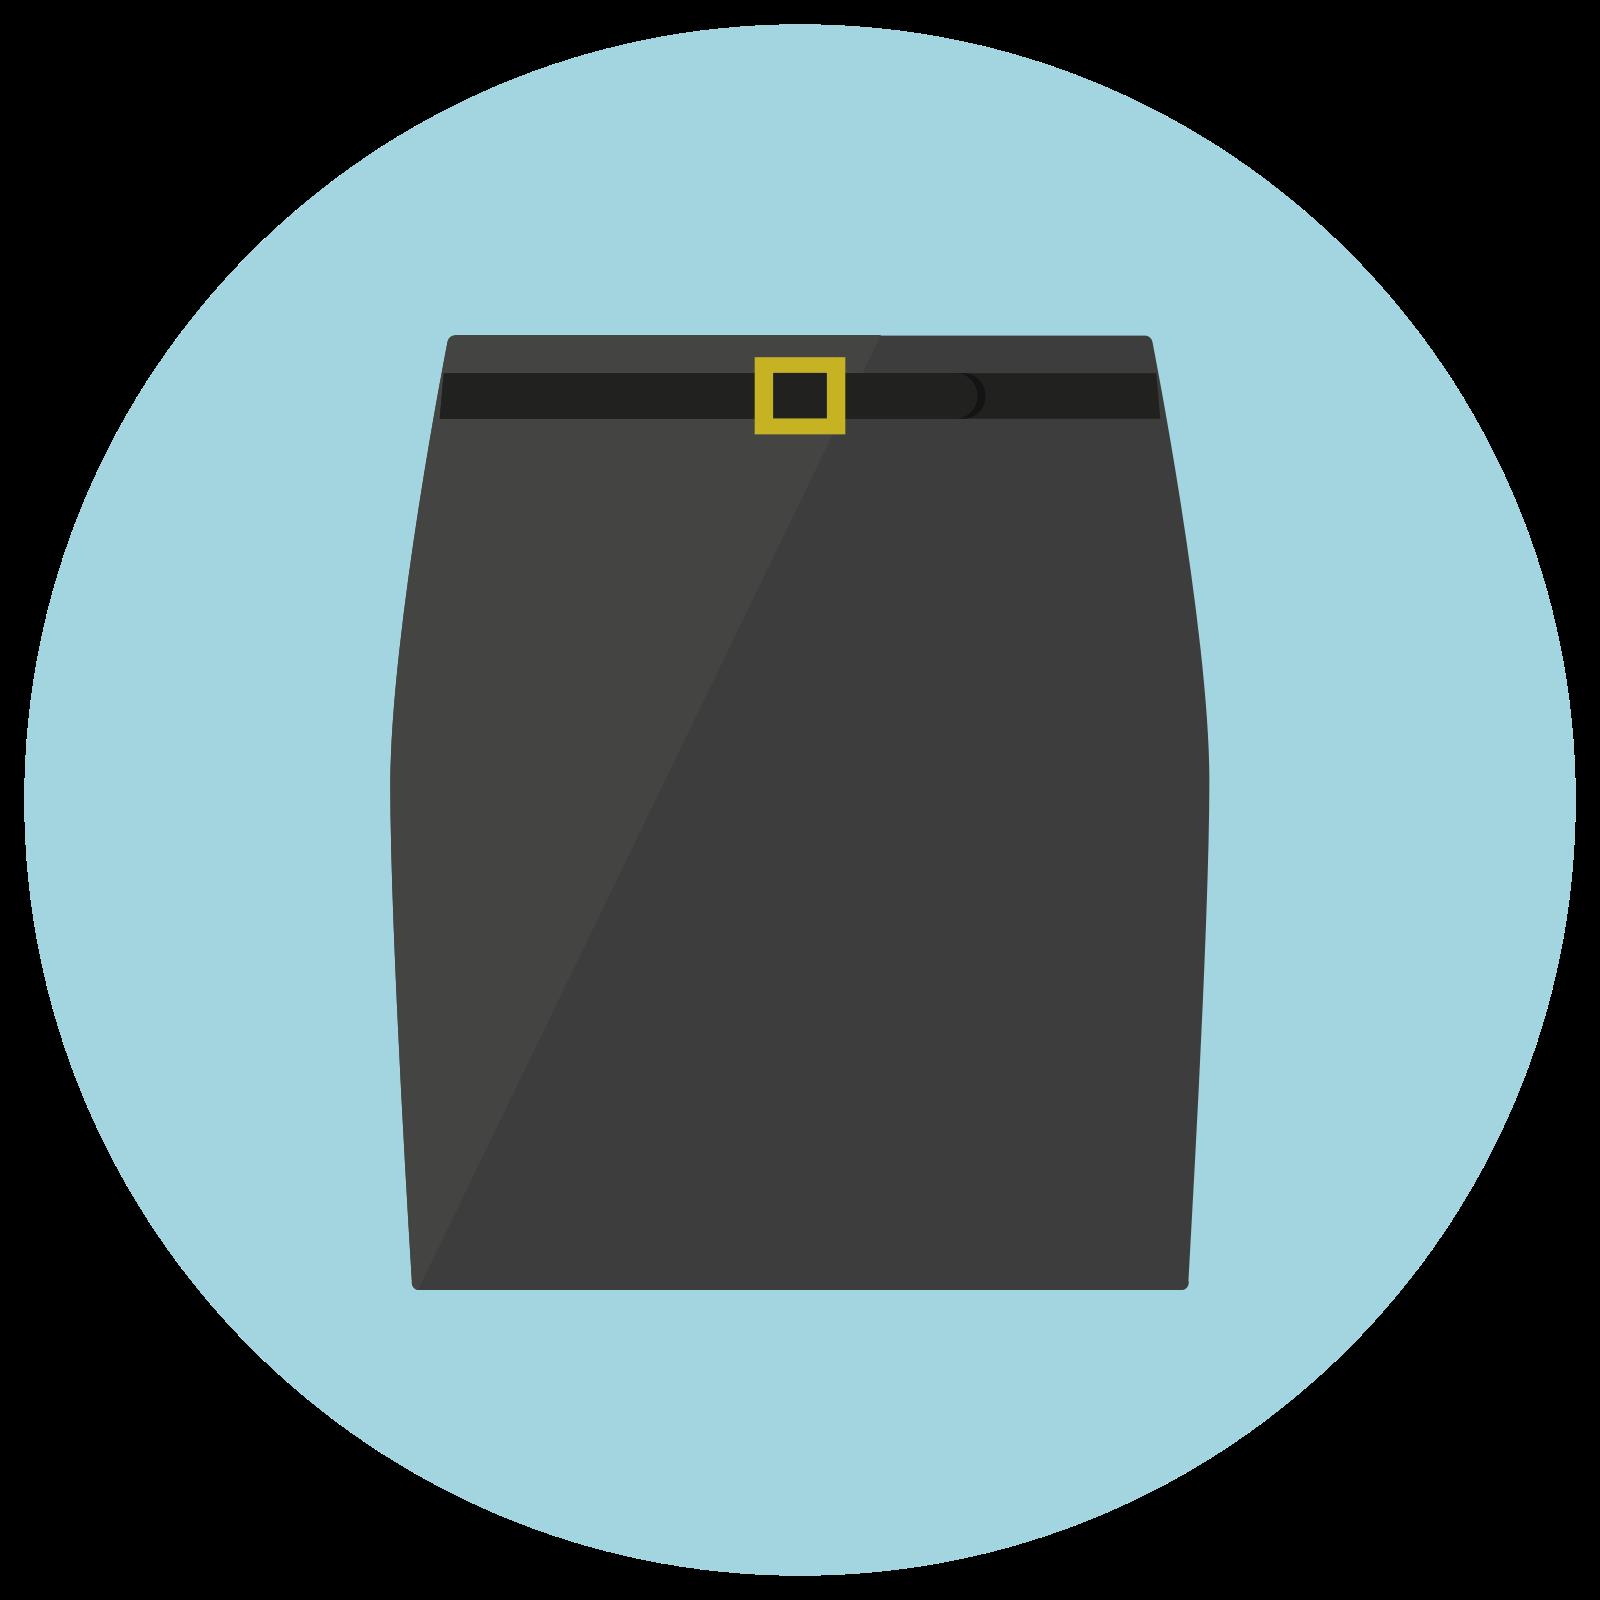 Юбка карандаш icon